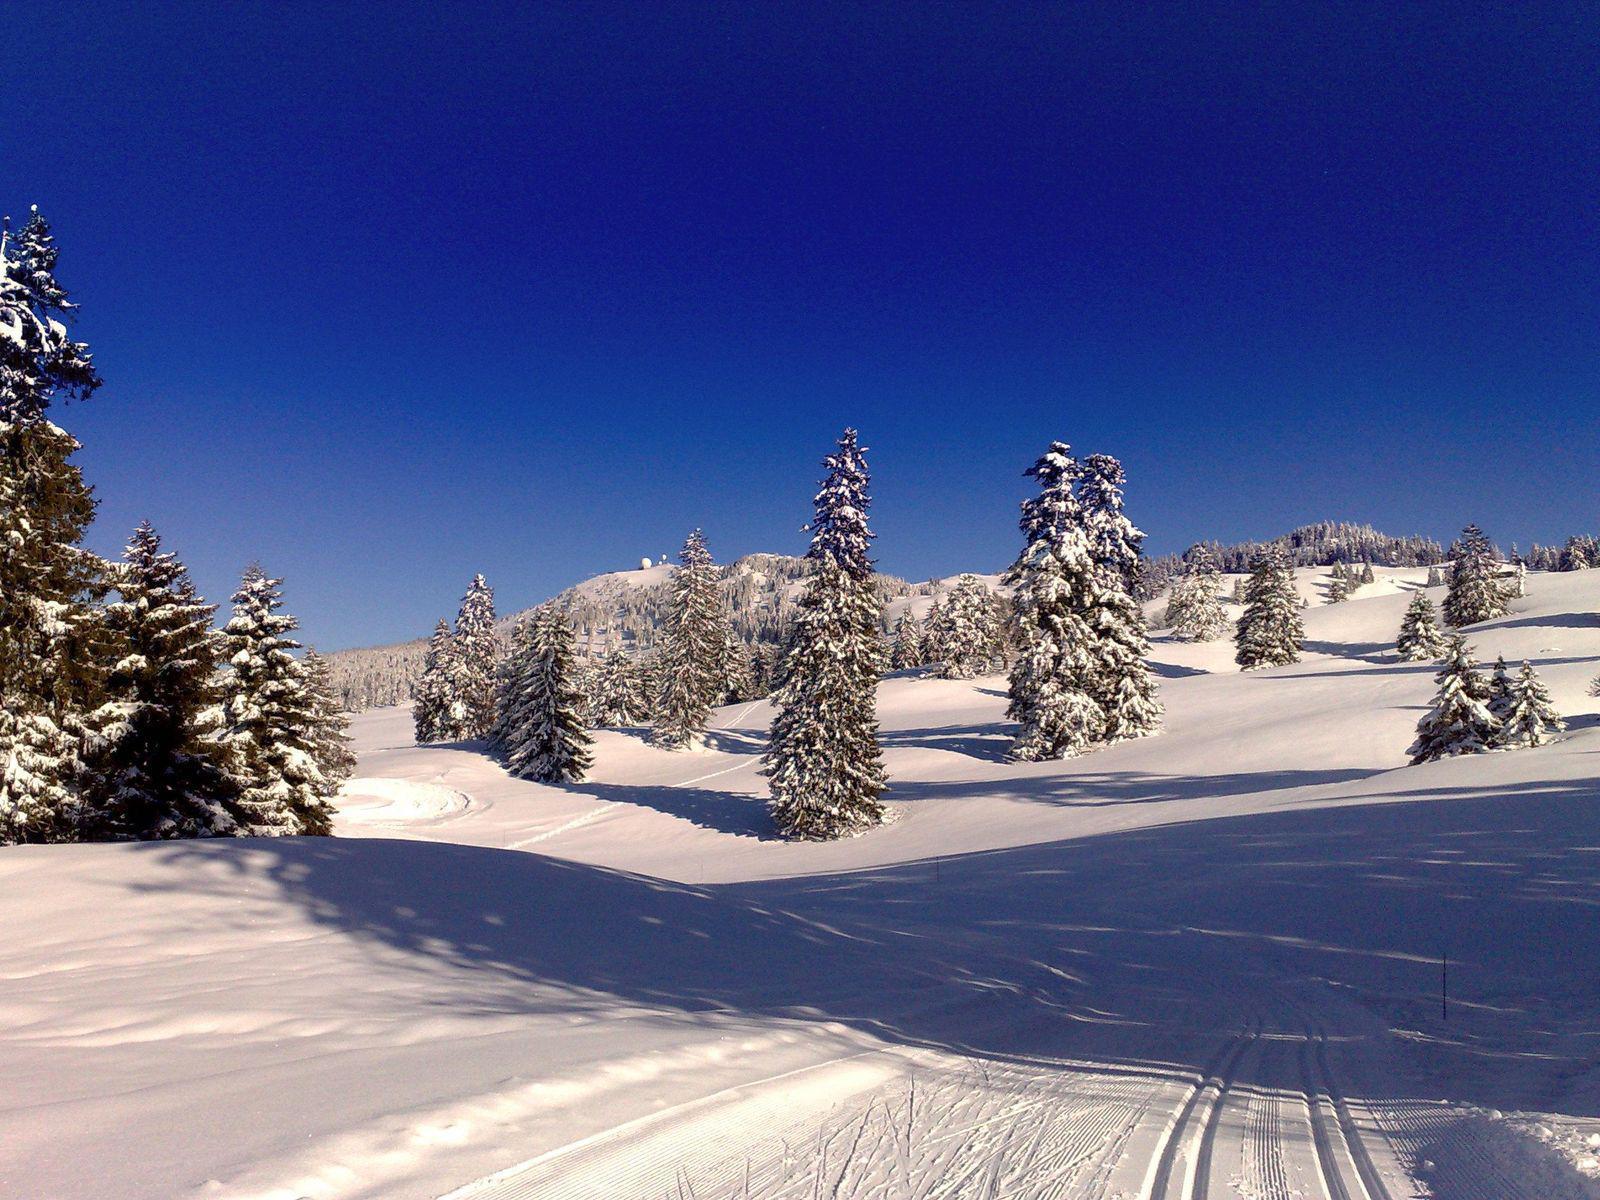 Domaine skiable MONTS JURA/LA VATTAY_Gex